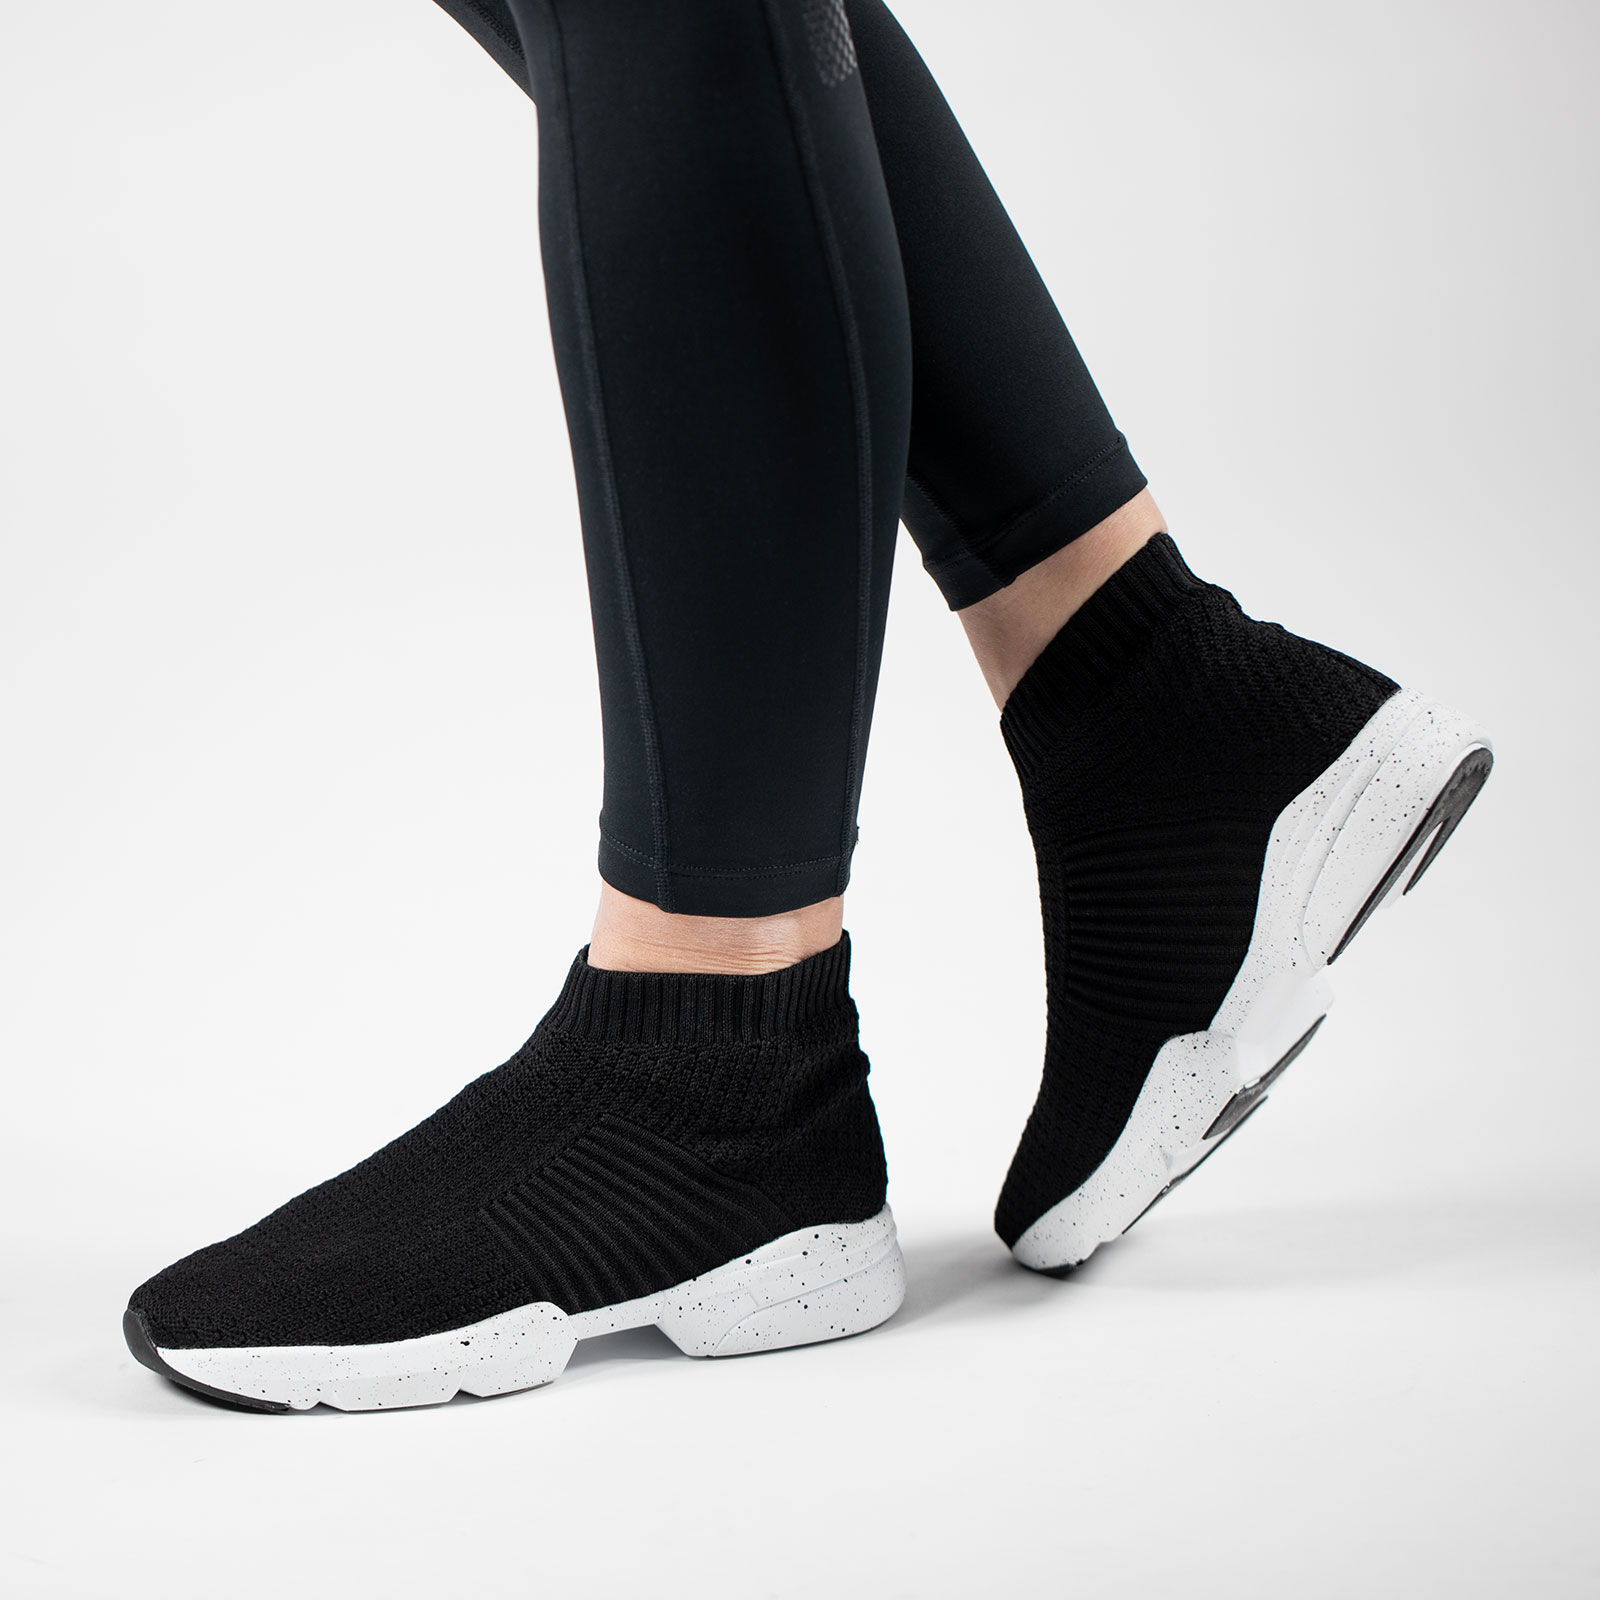 Women's Superlight Sock Trainers | Horze